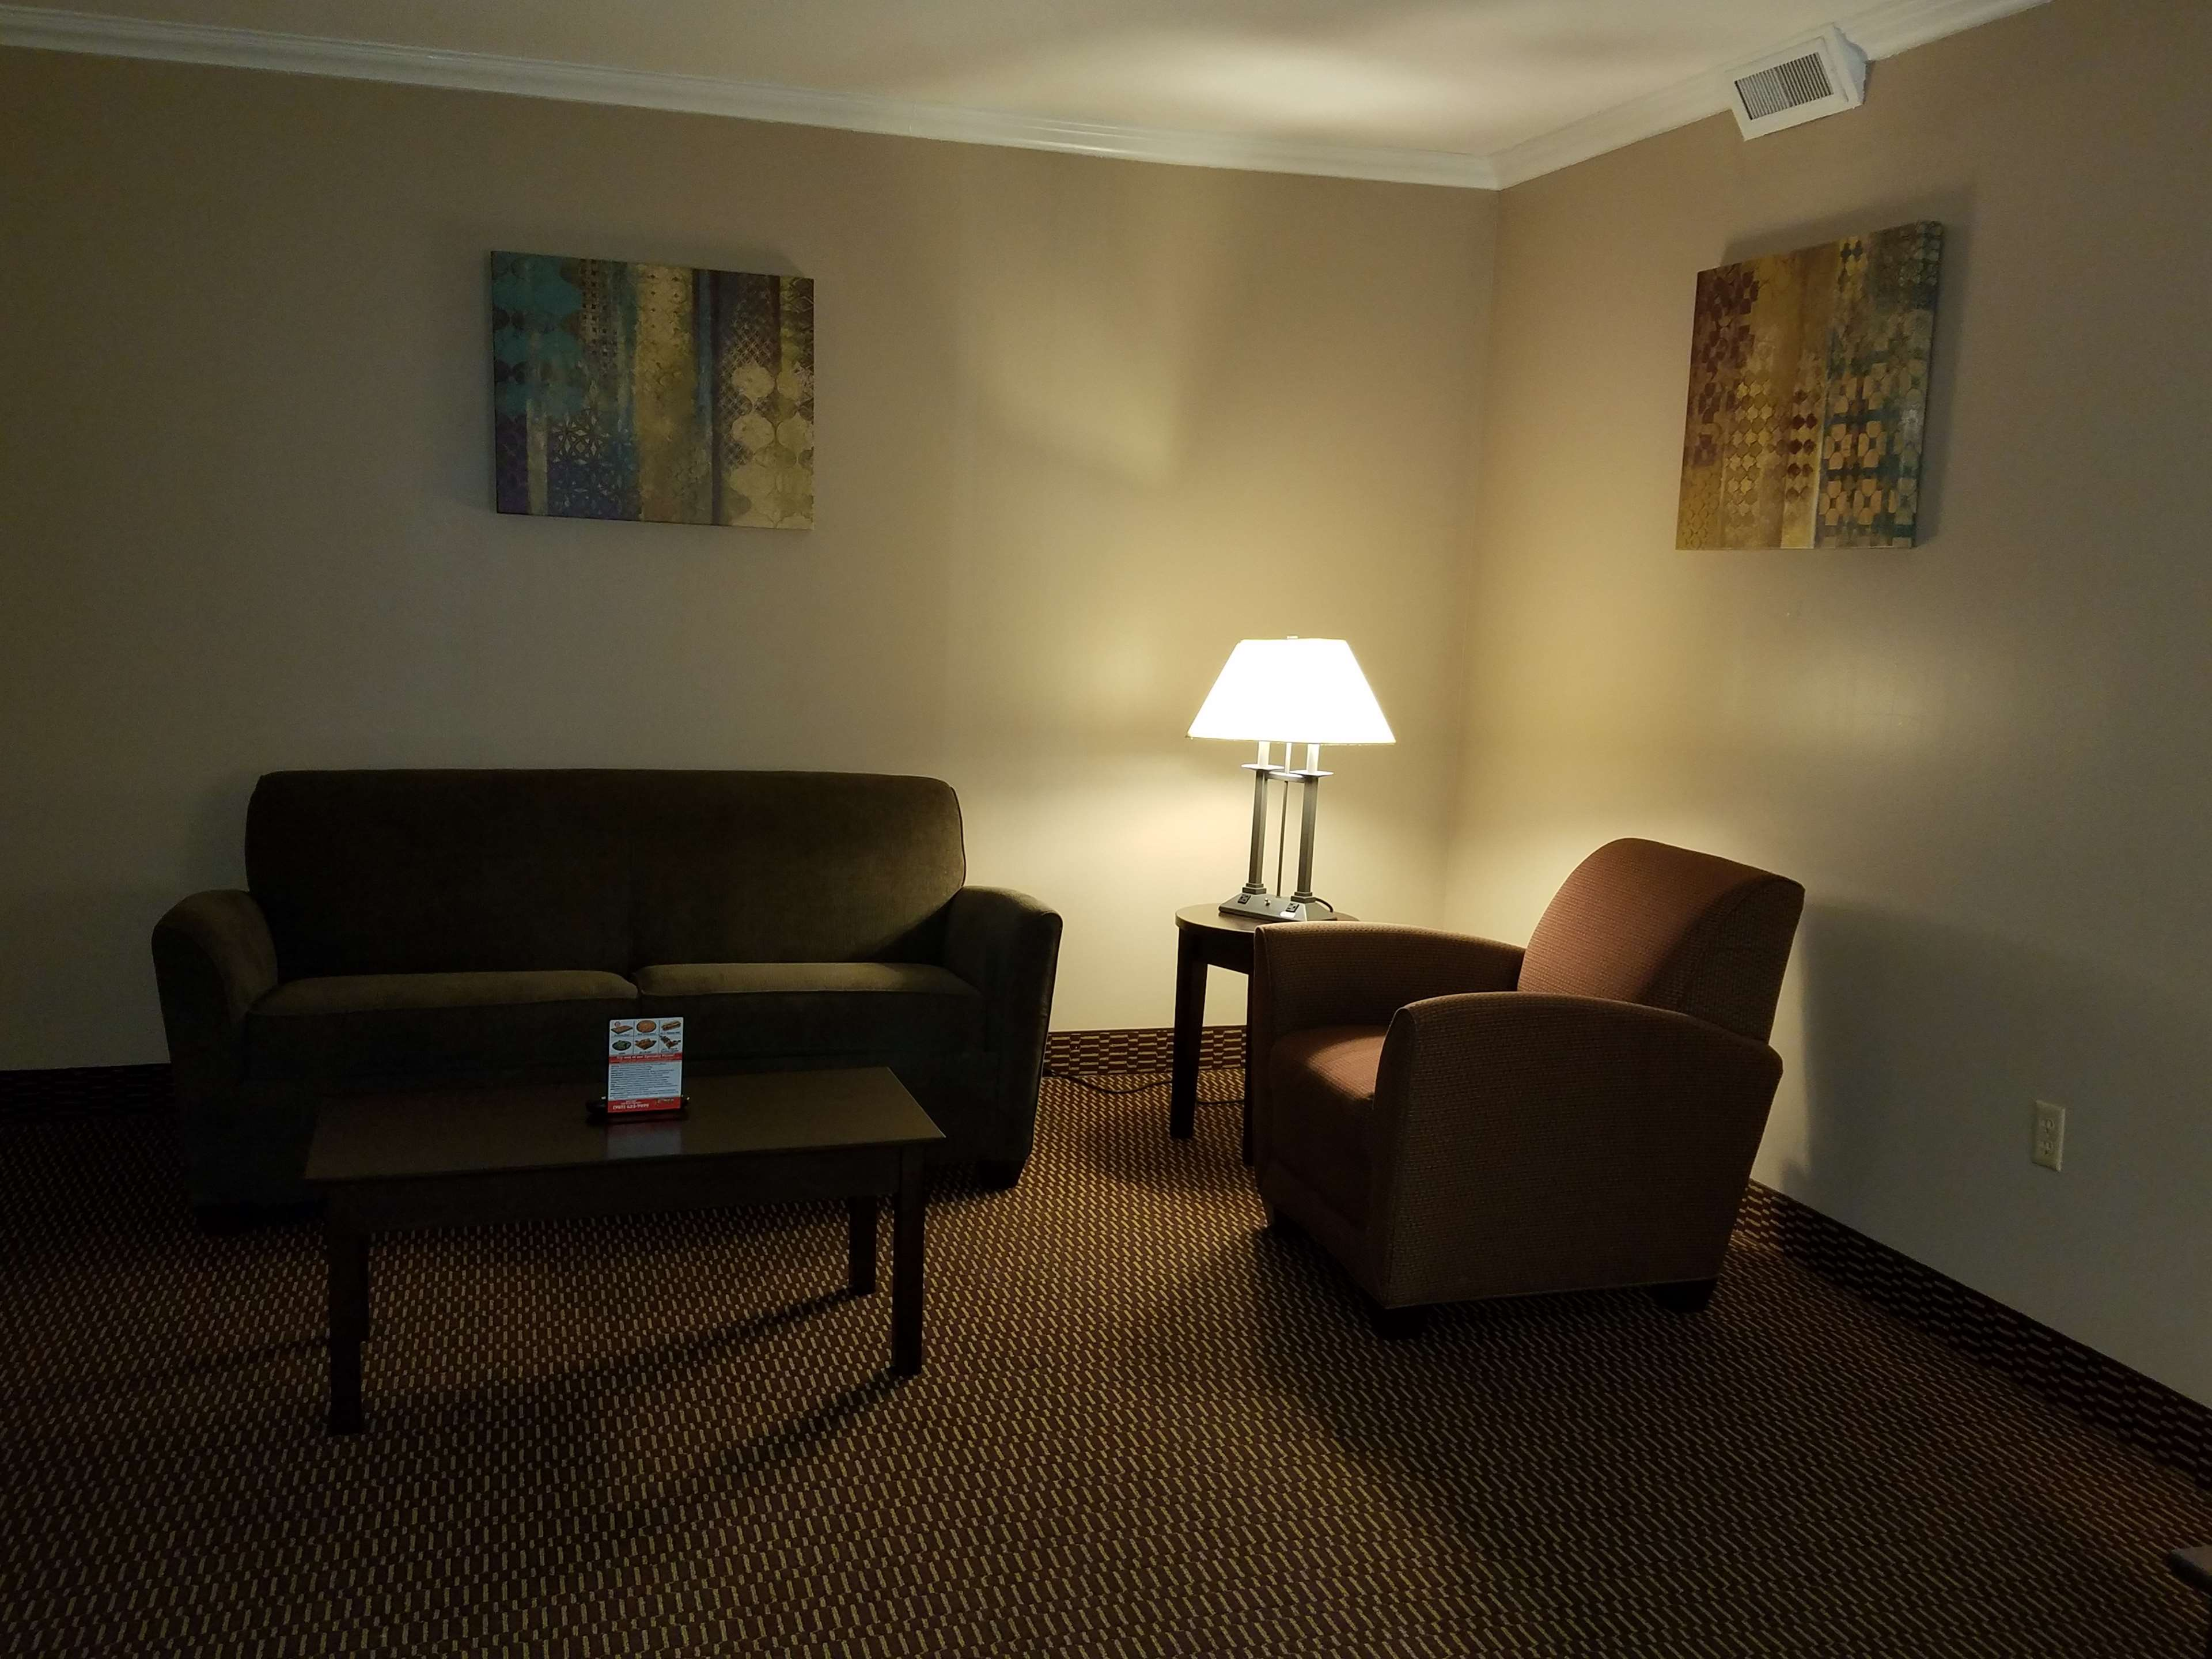 Best Western Valley Plaza Inn image 17